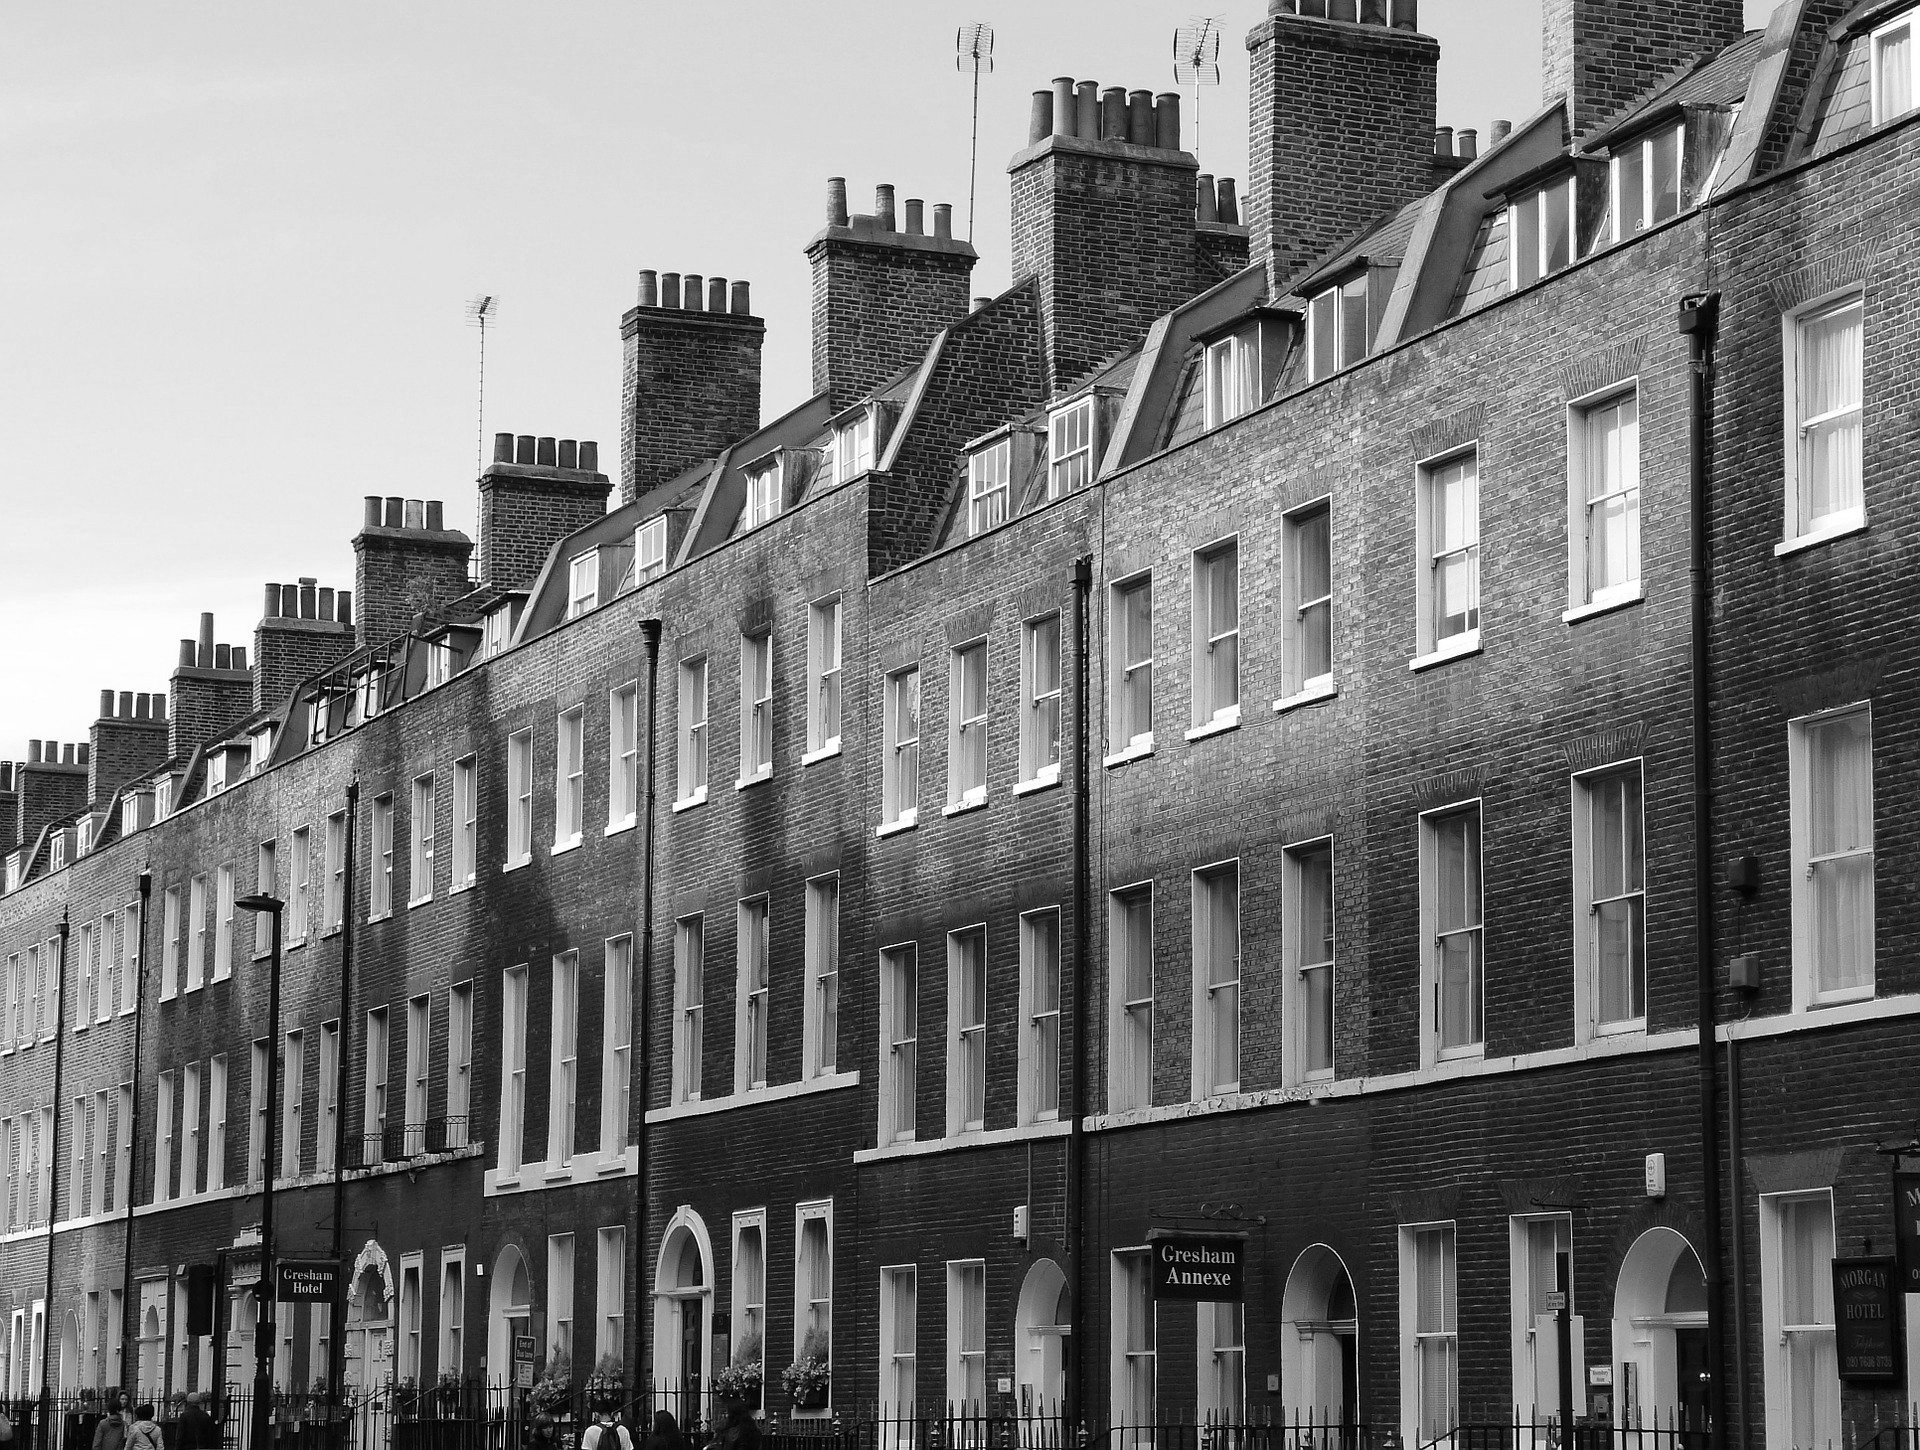 COVID-19 Lockdown: Worst-Hit Areas of the UK Property Market Revealed